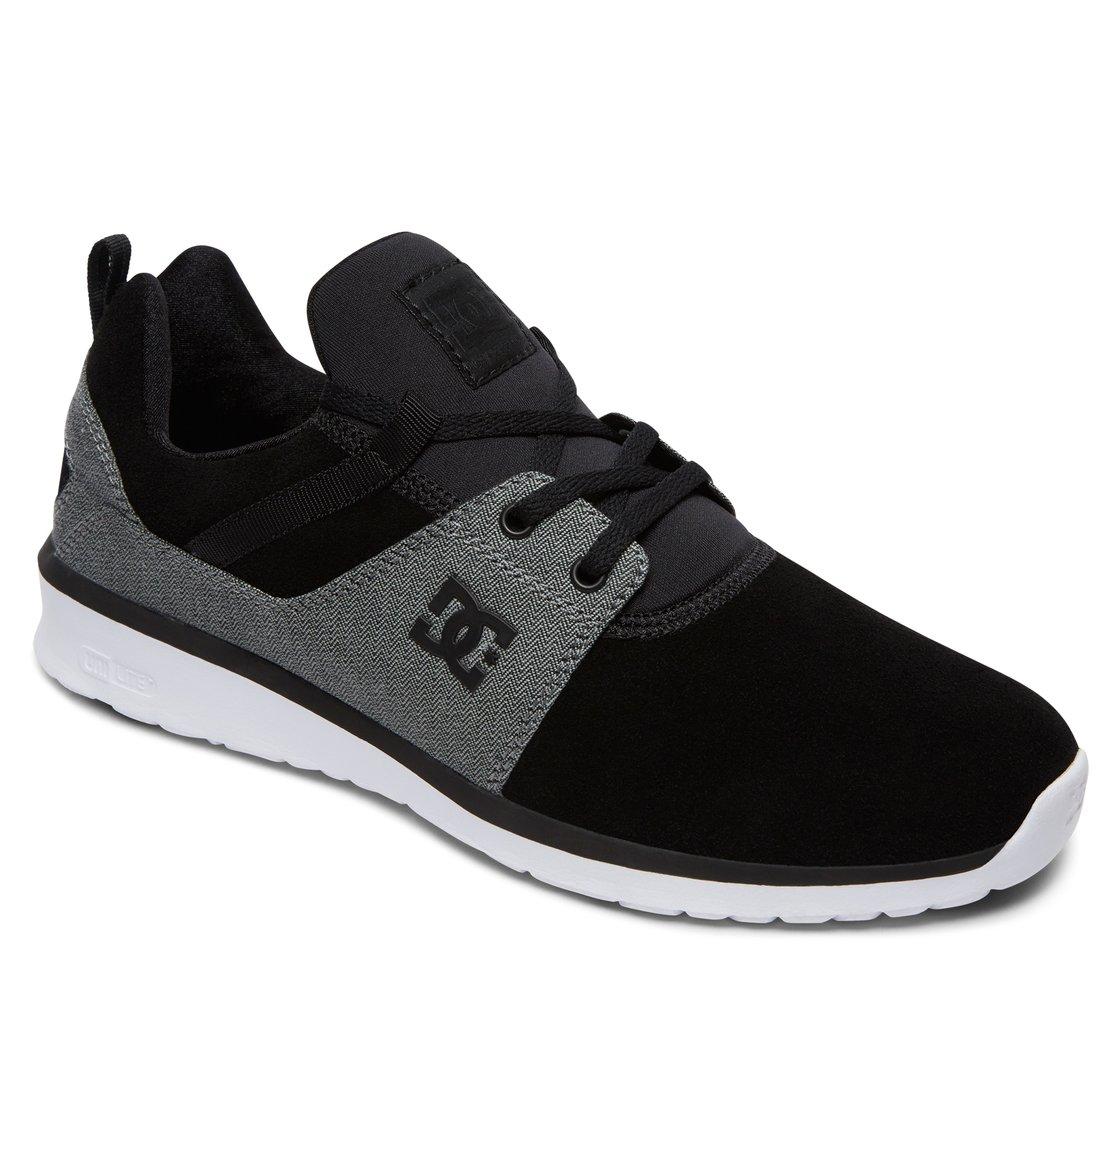 DC Shoes Schuhe »Heathrow SE«, schwarz, Black/white print